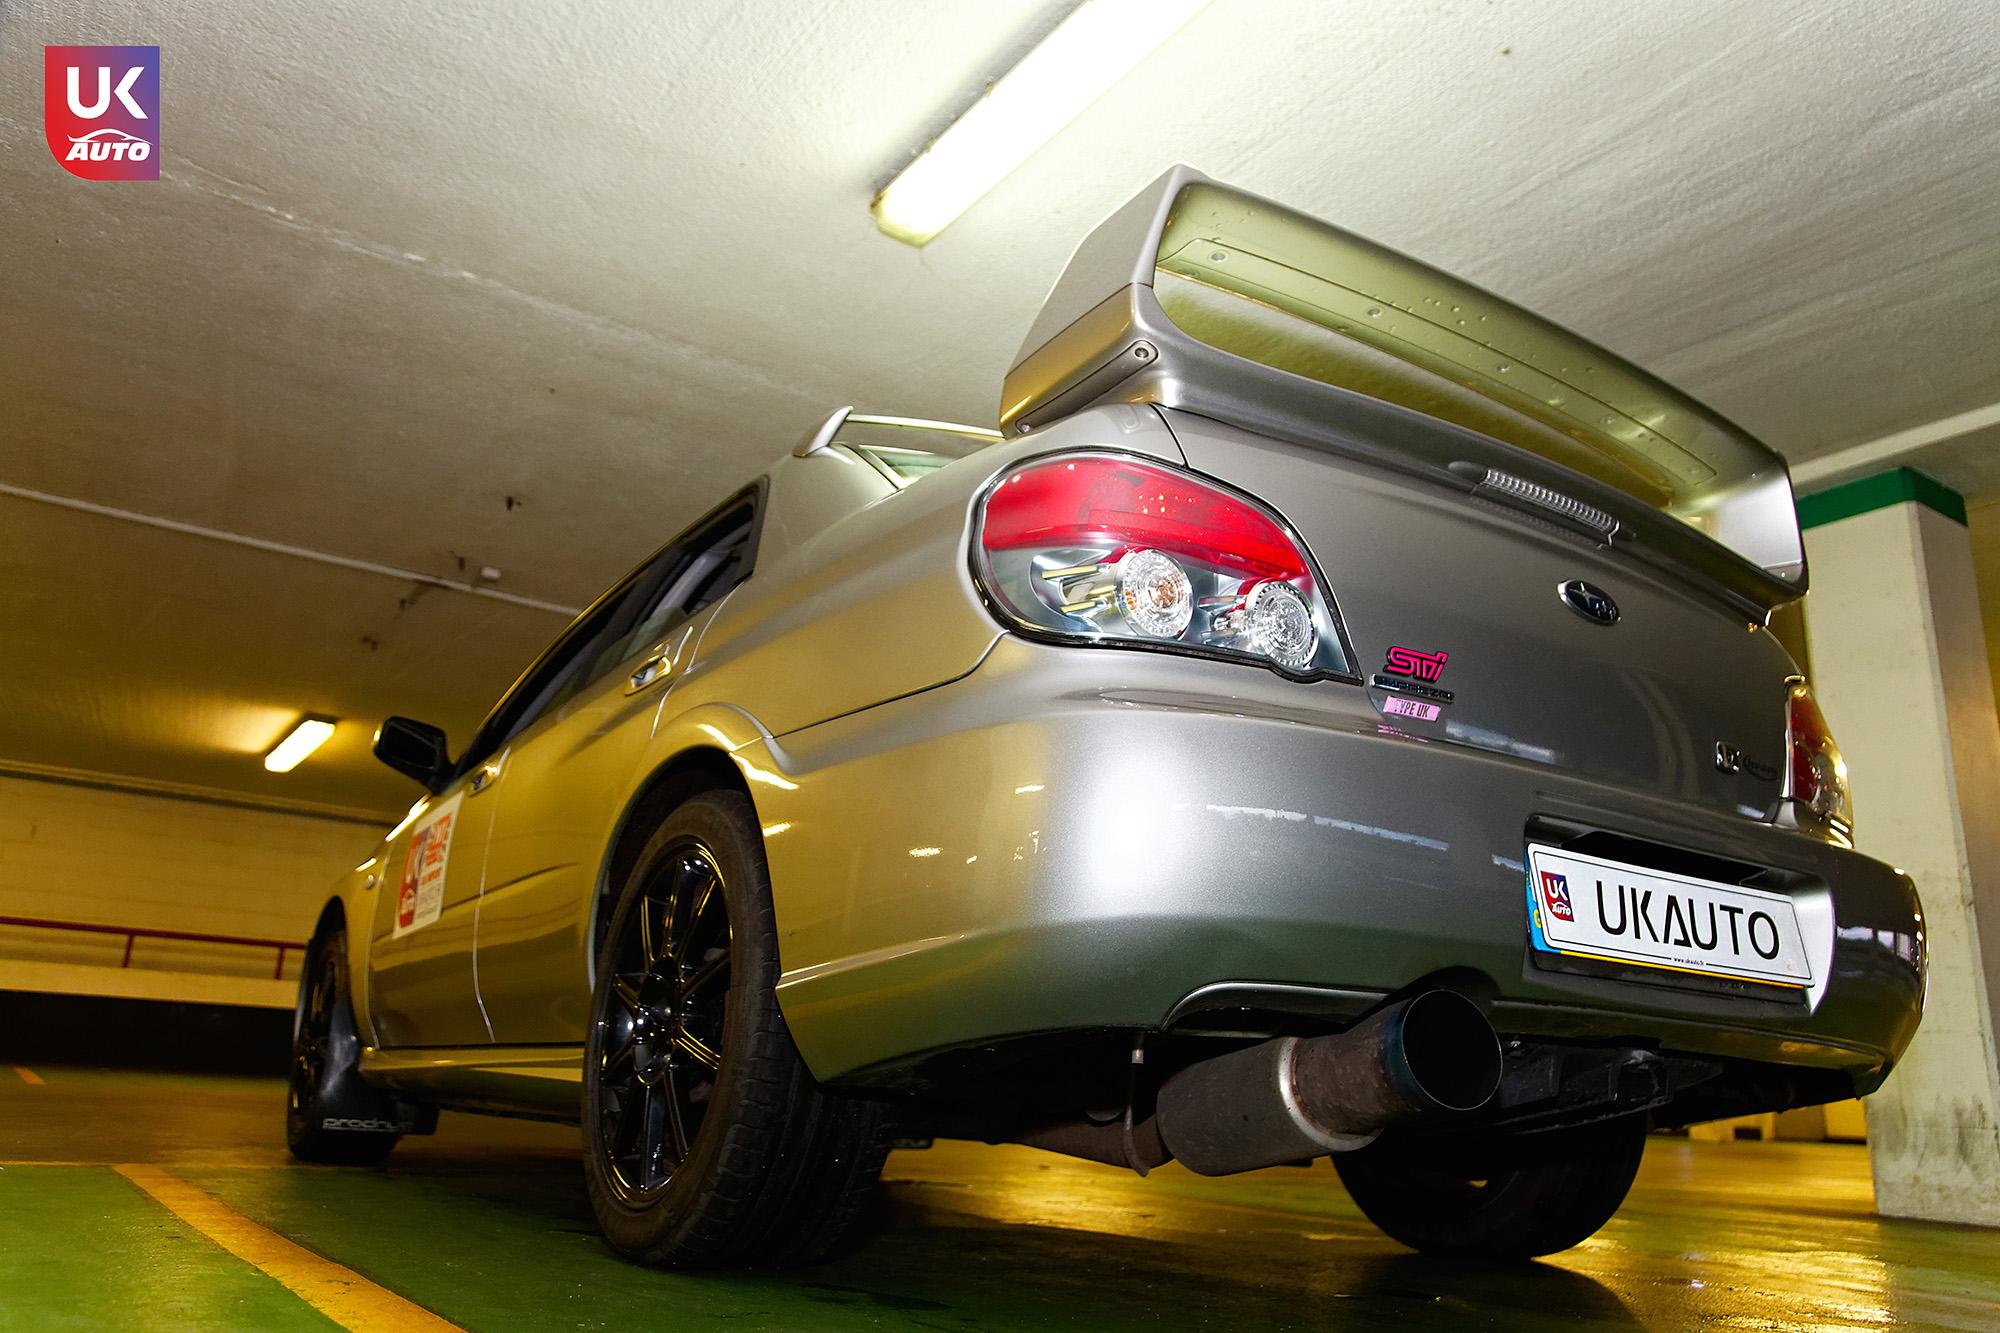 import subaru impreza wrx sti rhd import voiture angleterre auto import5 - Felecitation a Christophe pour cette Subaru Impreza Wrx Sti RHD Supercharged Importation voiture angleterre